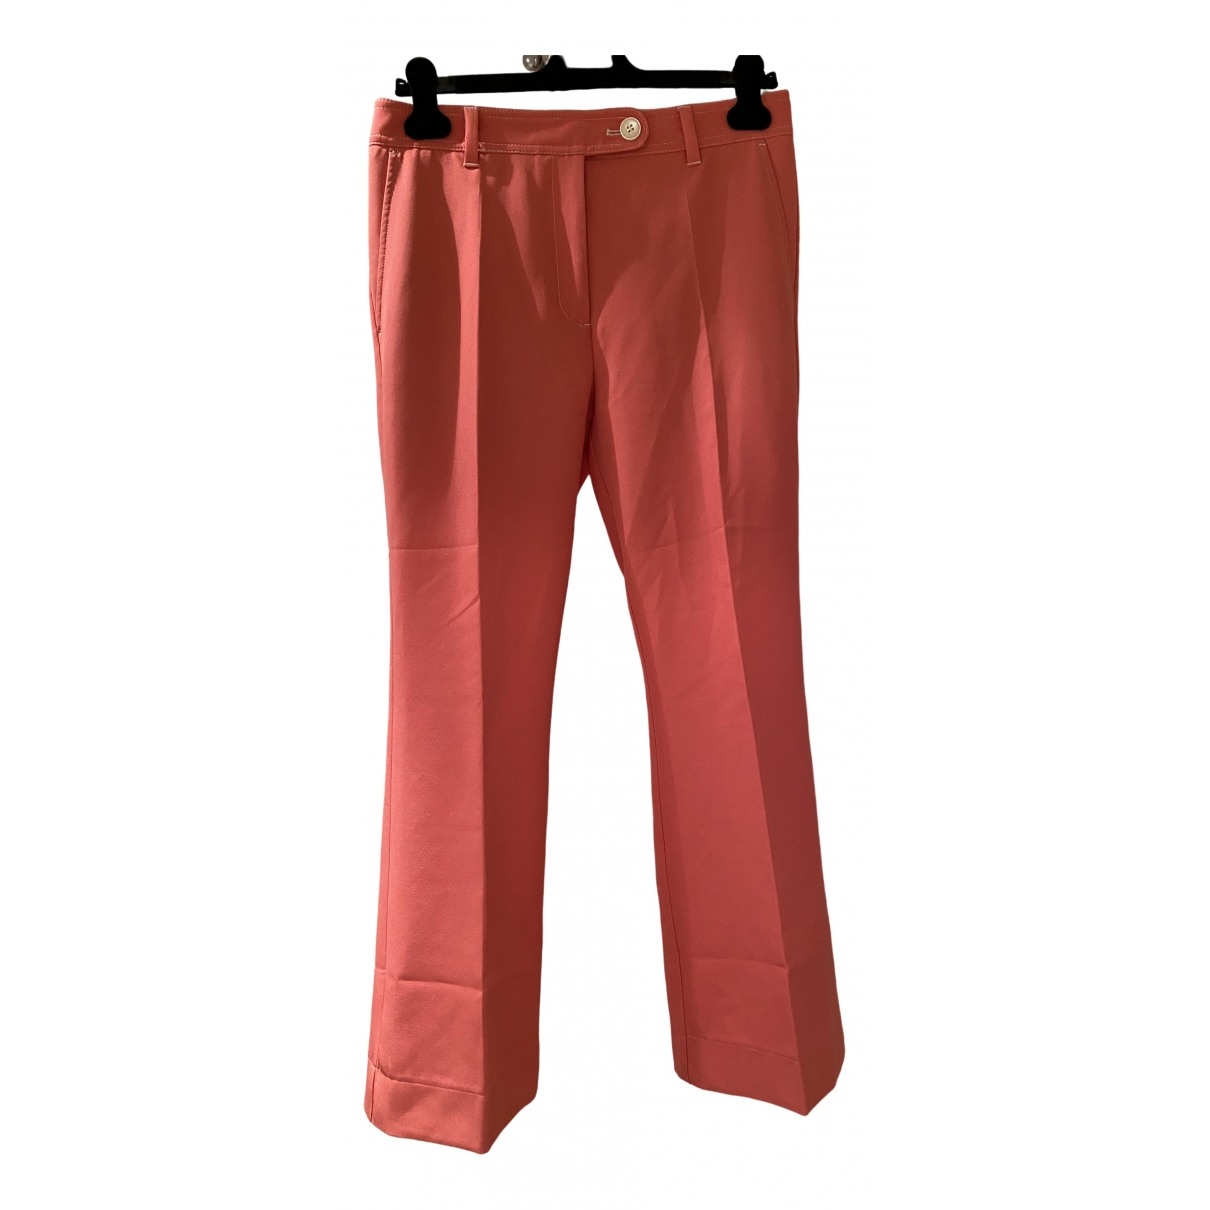 Stine Goya \N Pink Linen Trousers for Women M International